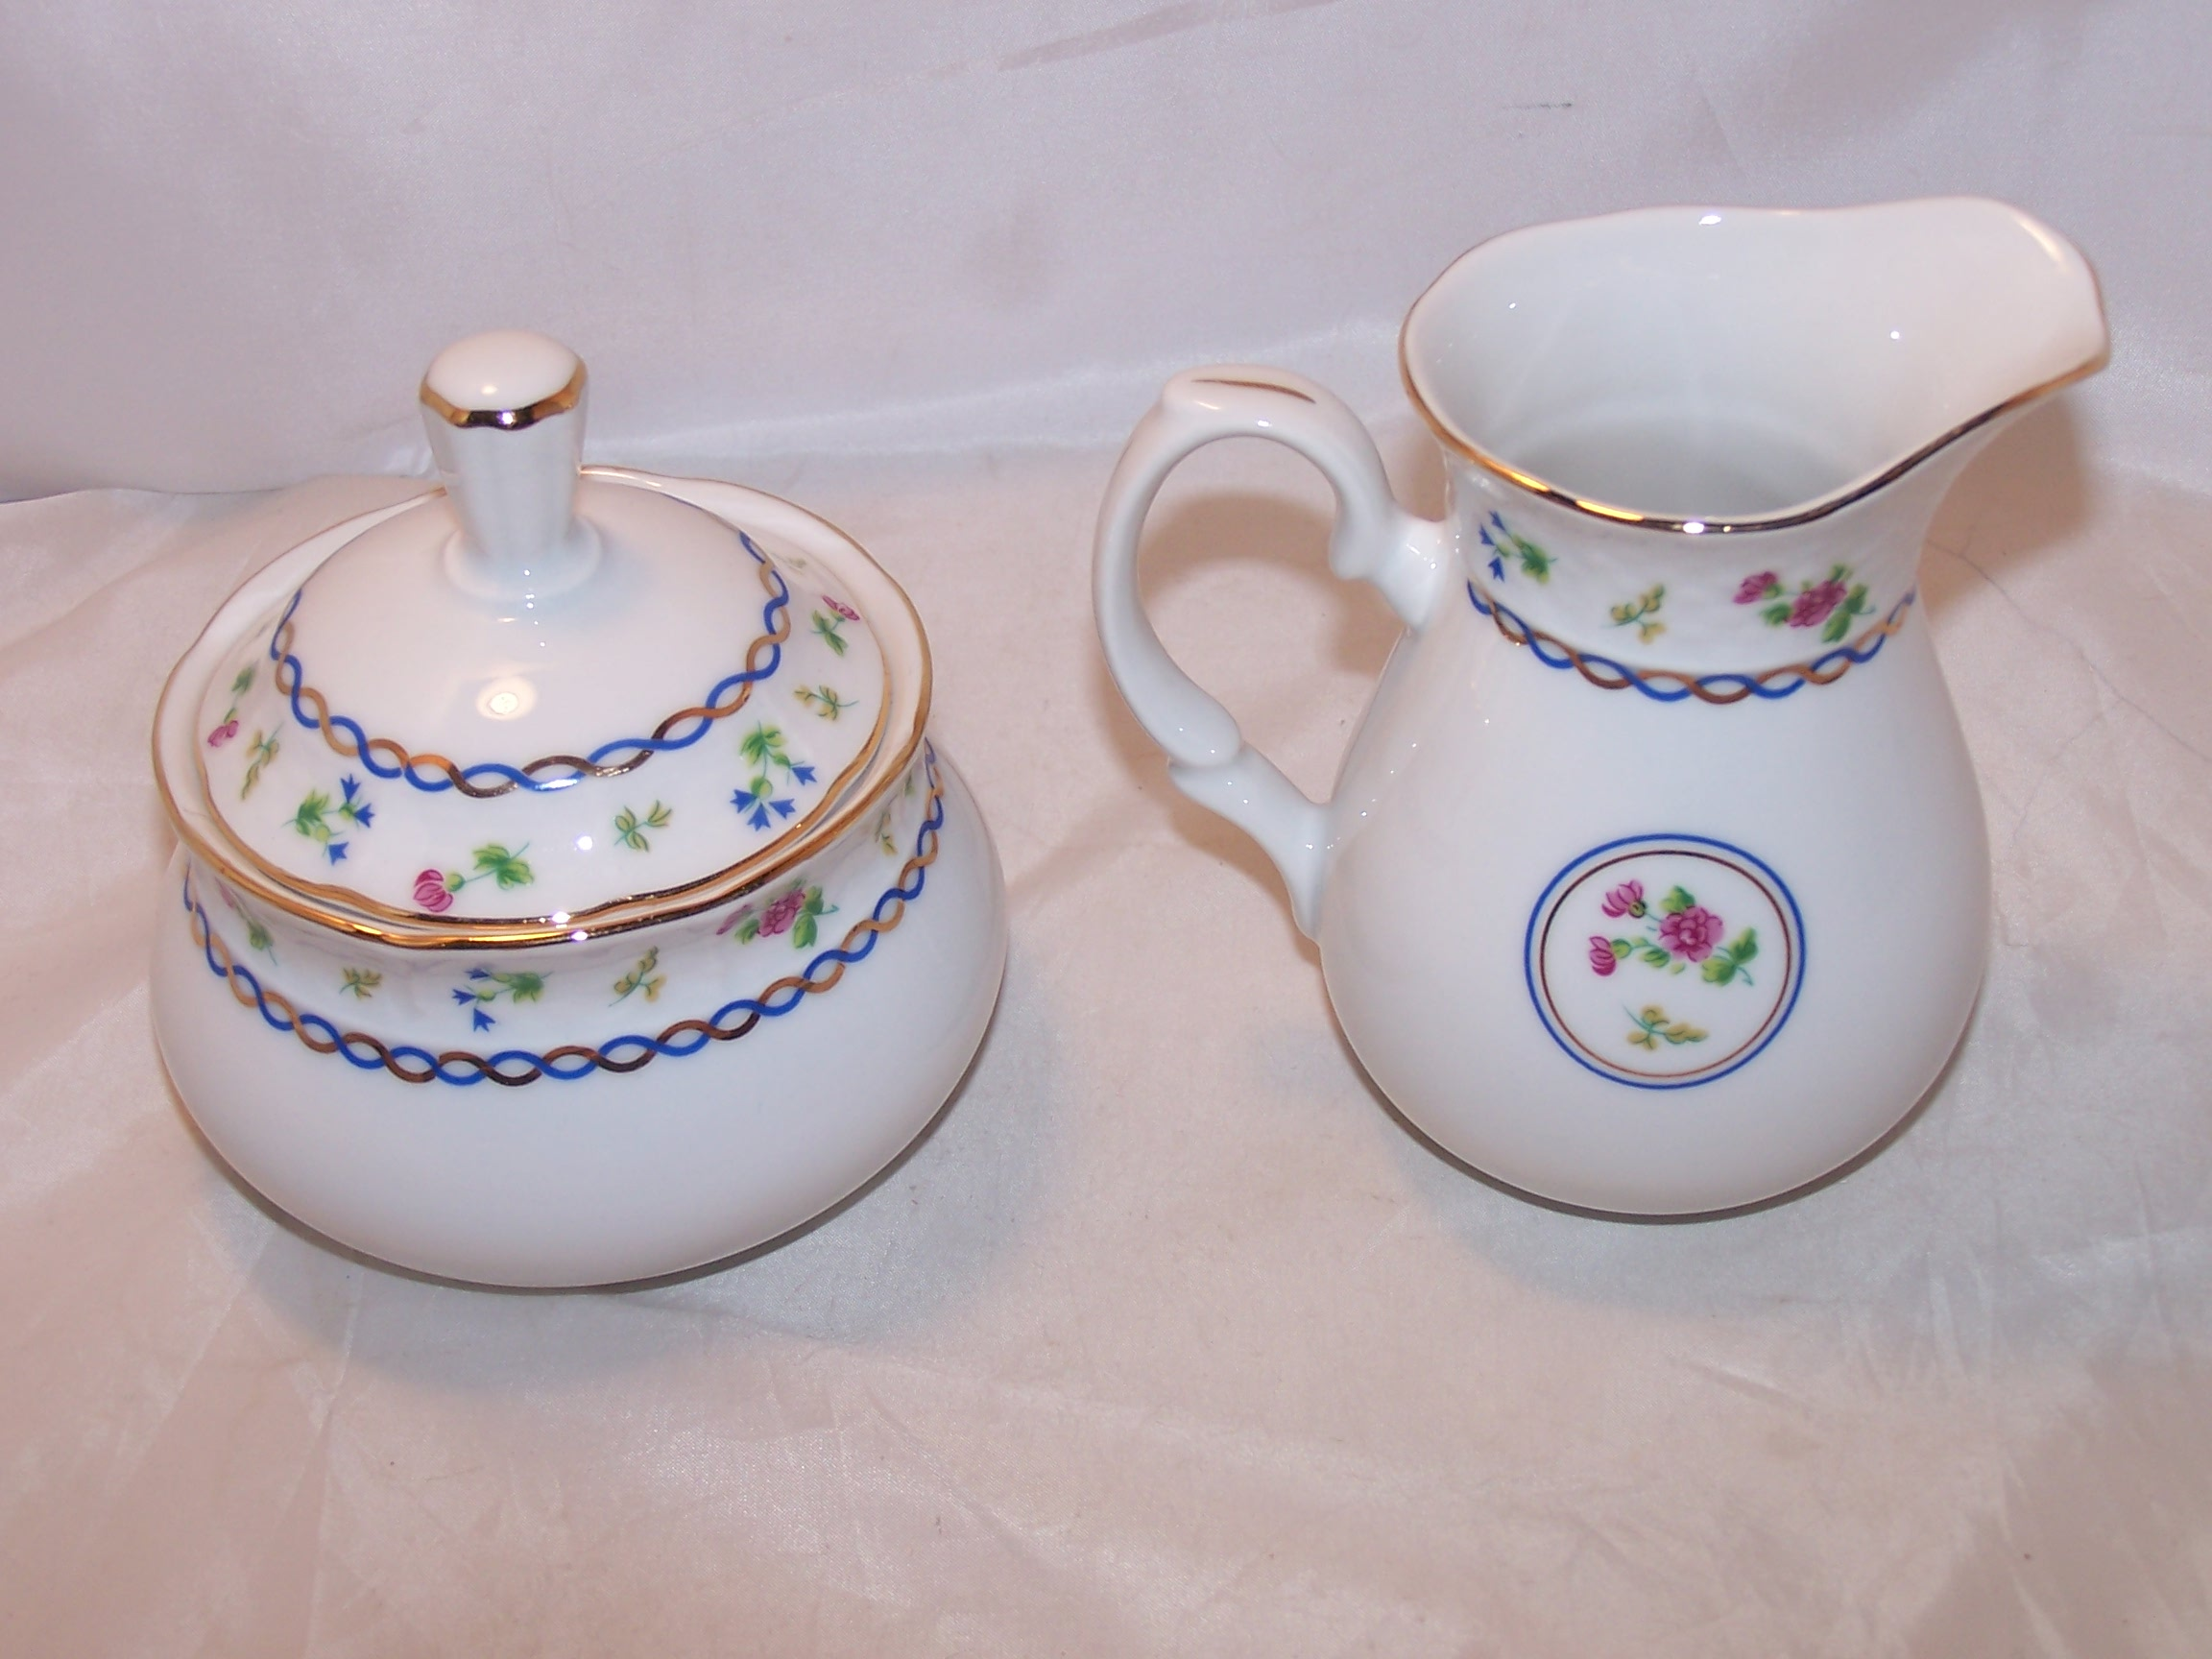 Image 2 of Baum Bros Thun Porcelain Creamer and Sugar, Czechoslovakia